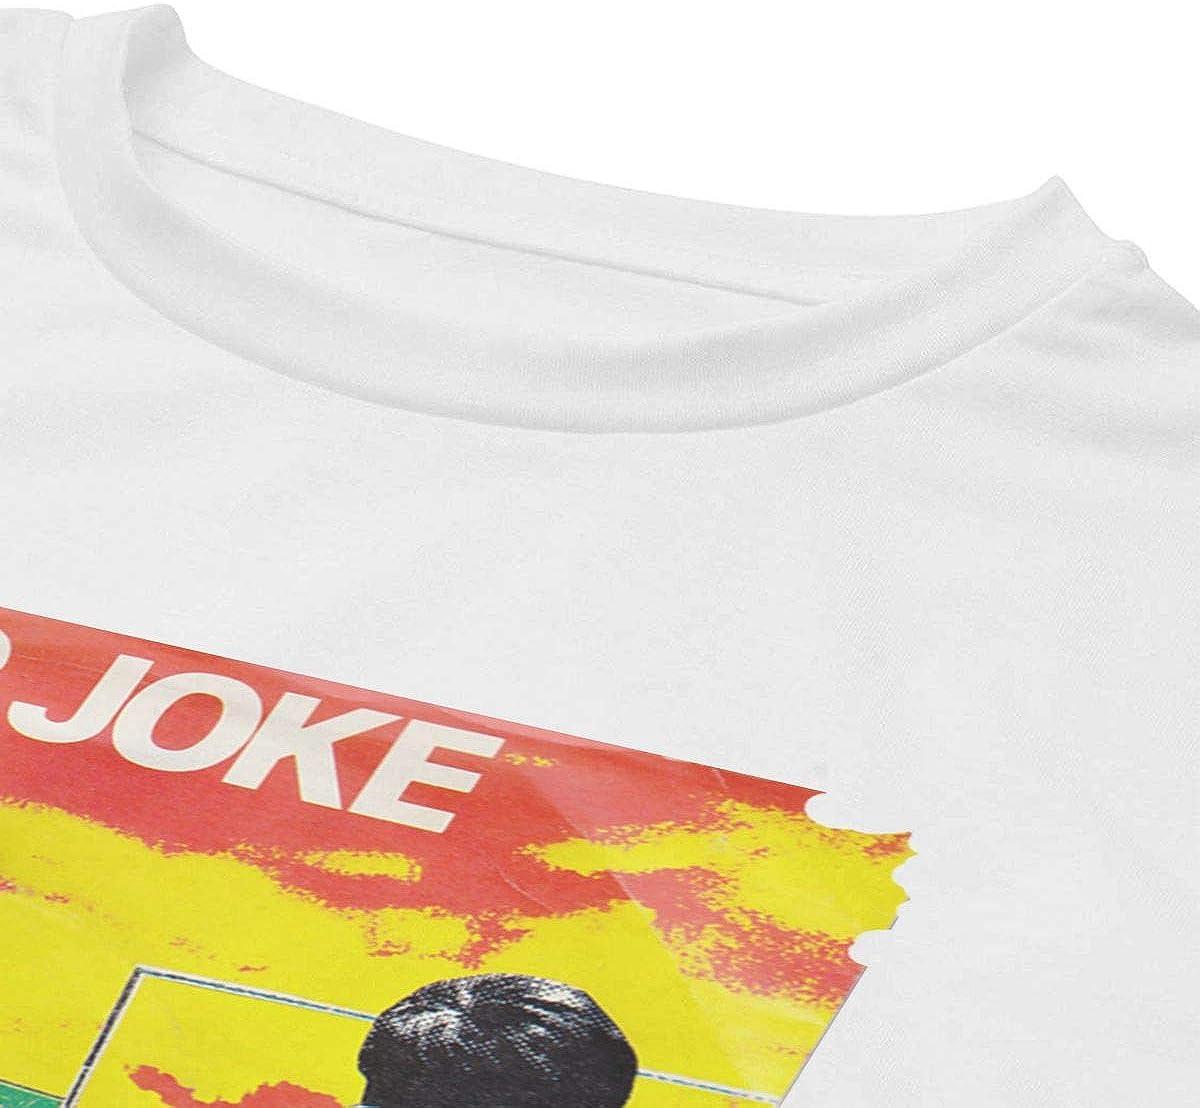 Yaruiguan Women 100/% Cotton Shirts Tops Killing Joke Follow The Leaders Design Round Collar Shirts Tops